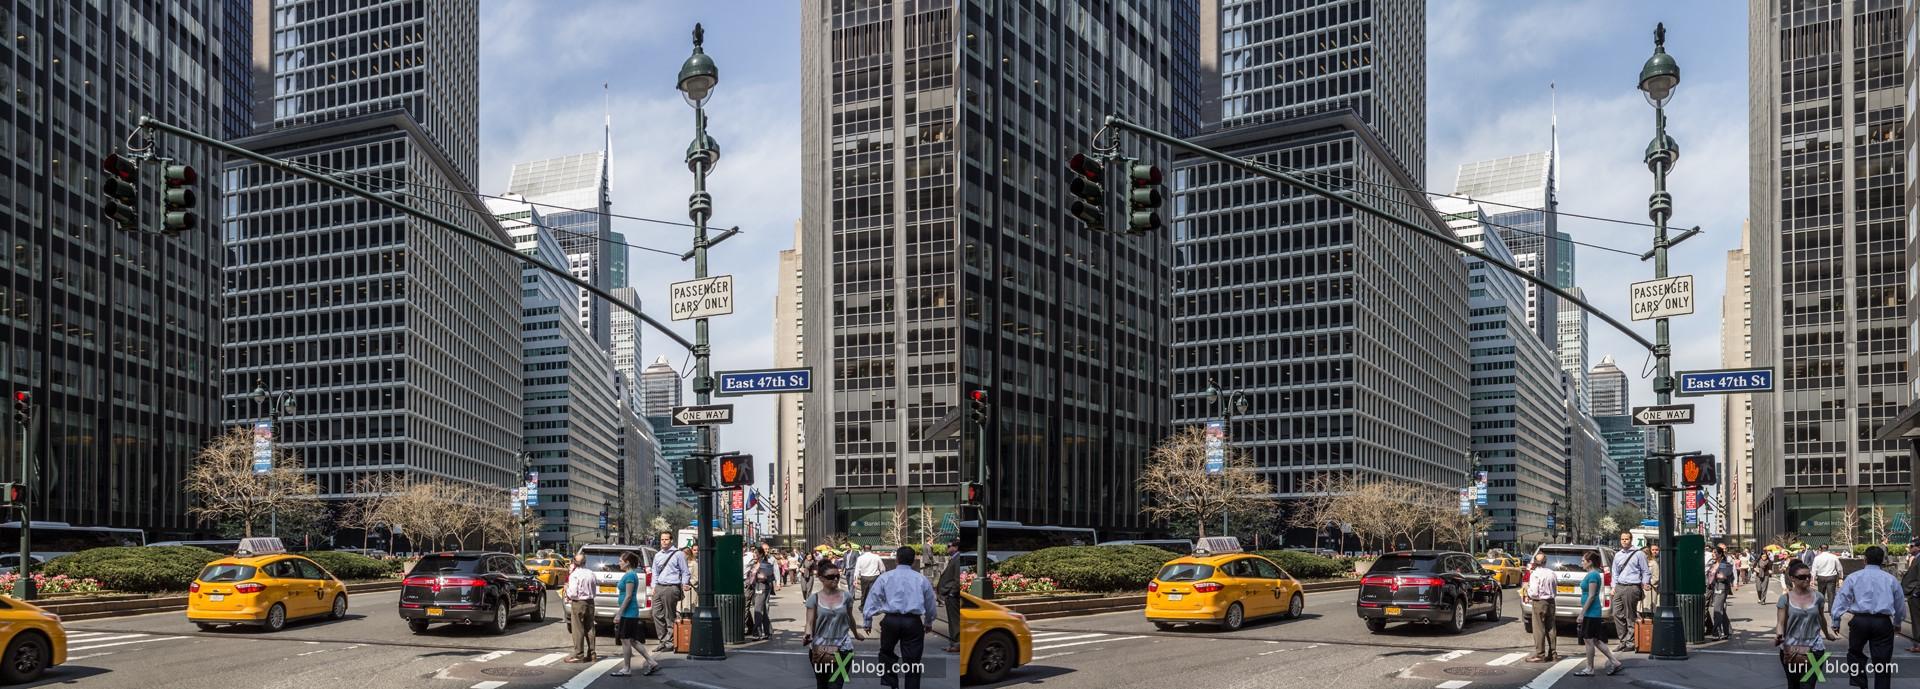 2013, Park Ave, Нью-Йорк, США, 3D, перекрёстные стереопары, стерео, стереопара, стереопары